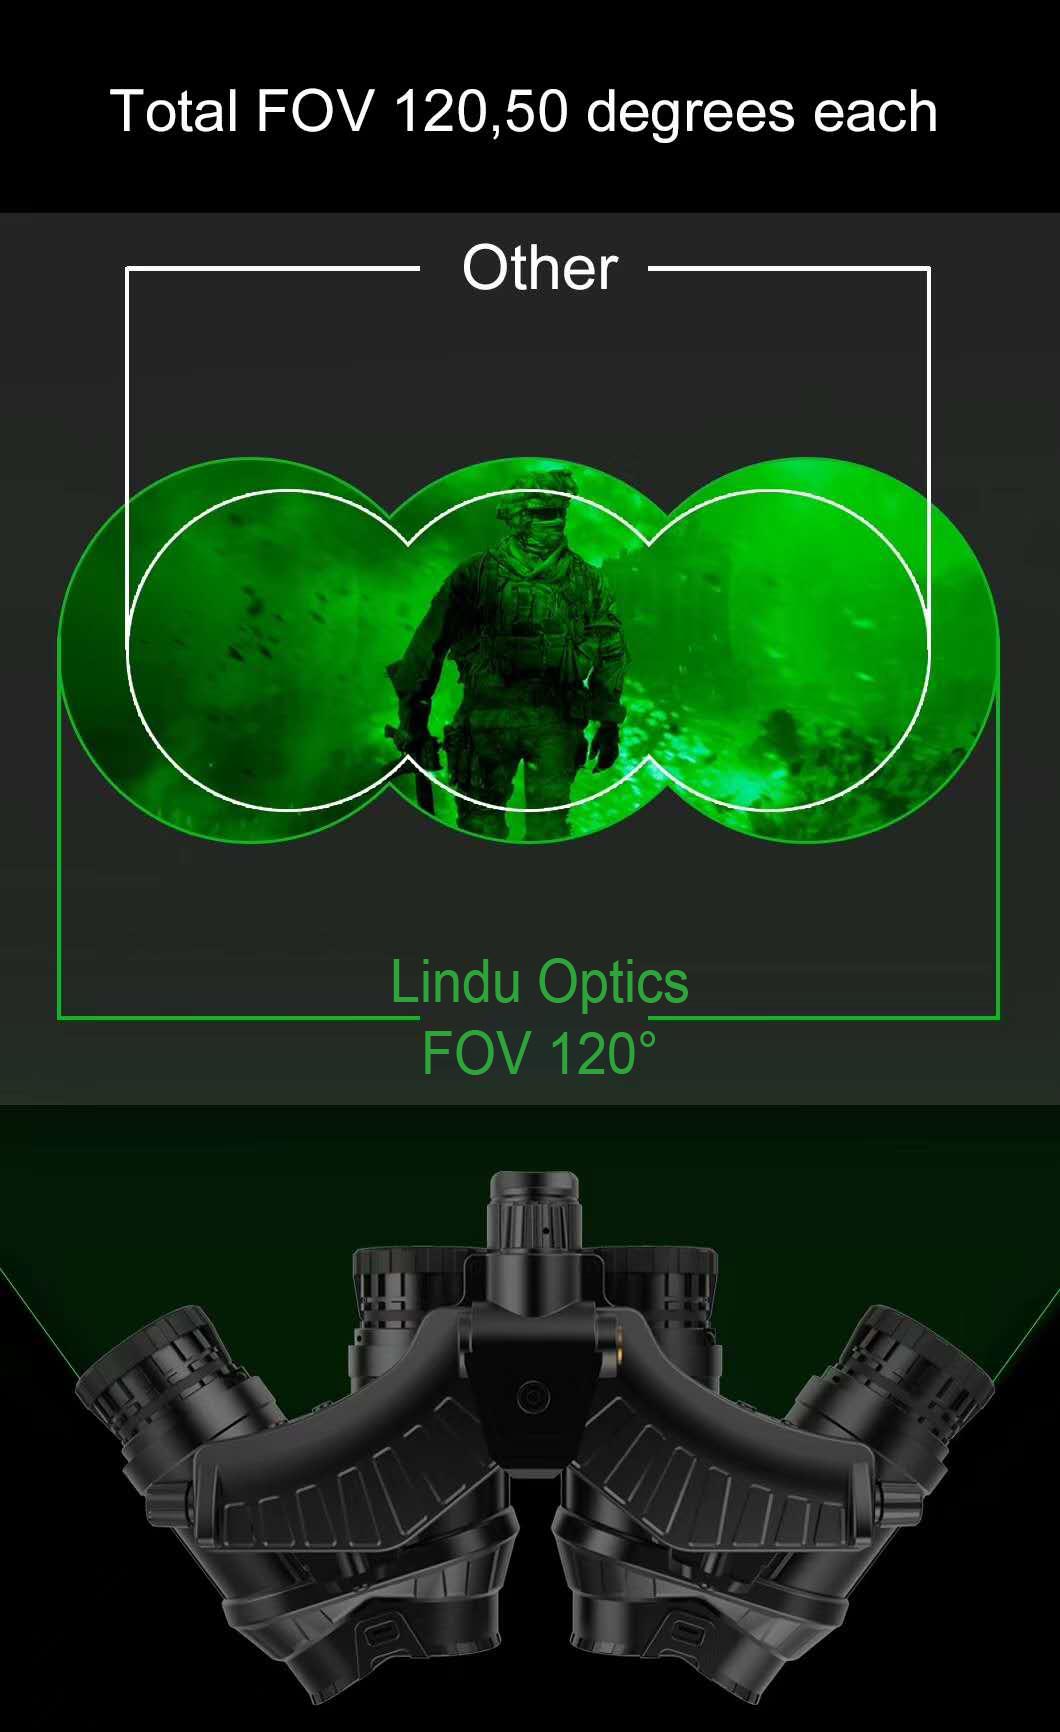 lindu optics quad eye tubes gpnvg18 Ground Panoramic night vision goggles